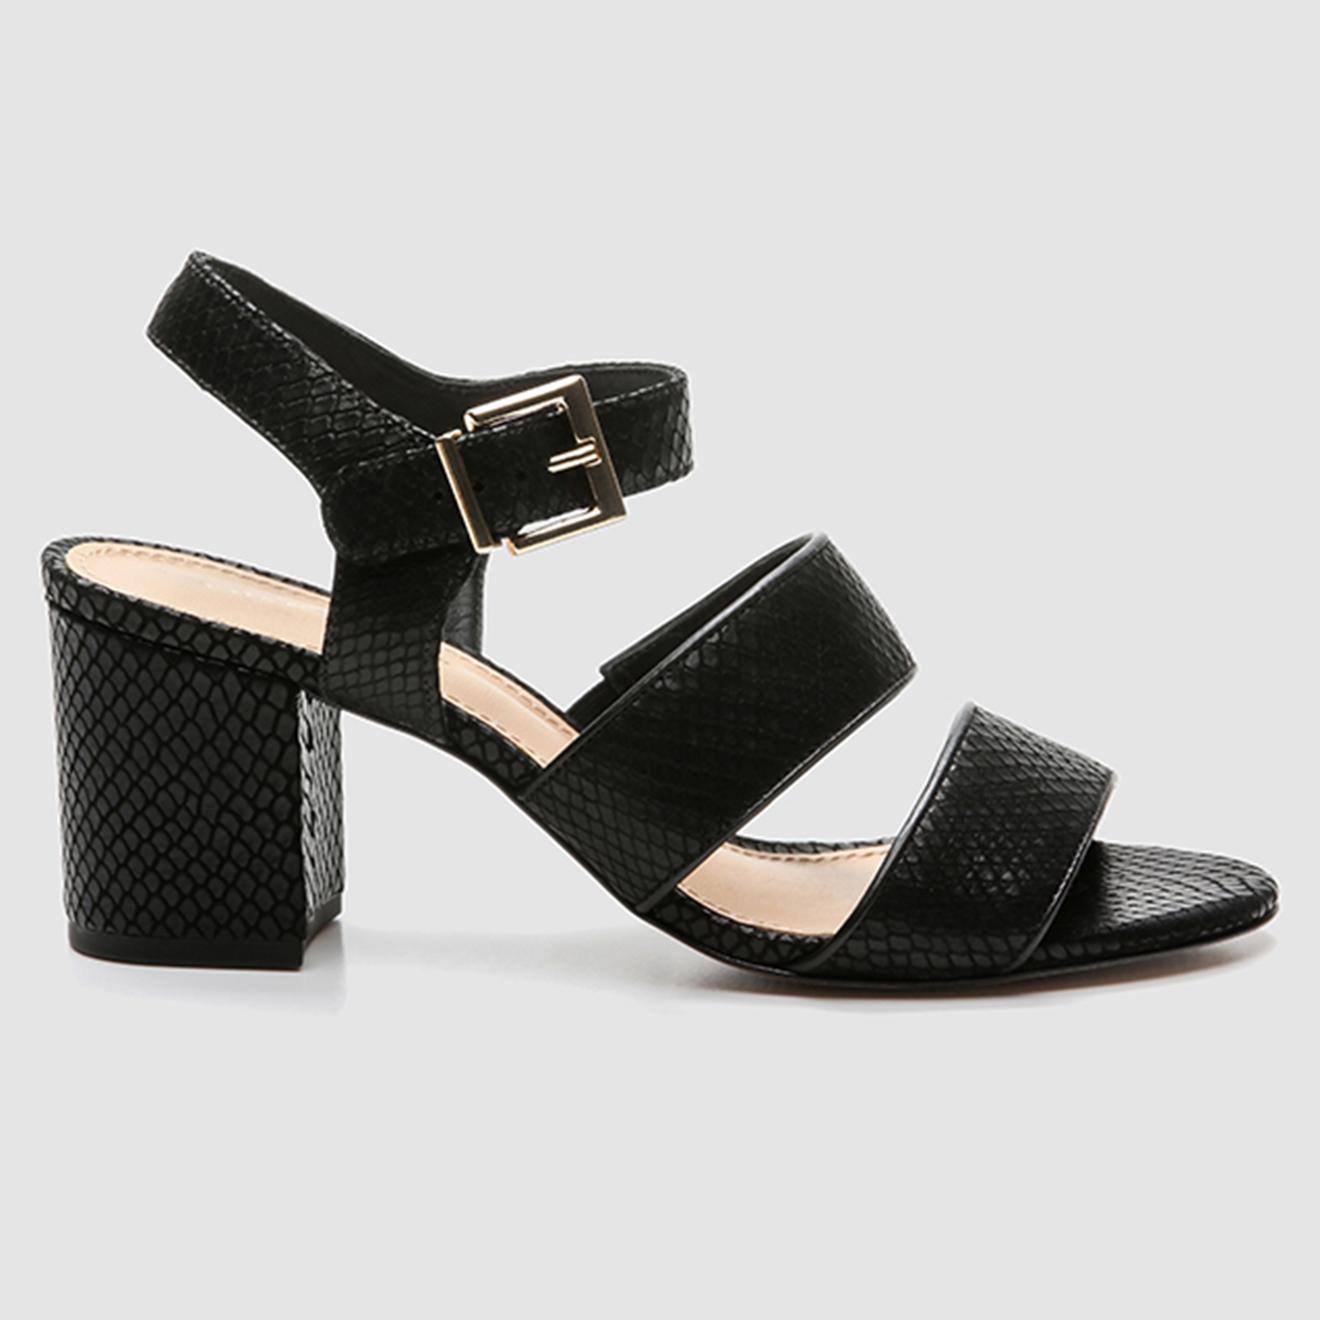 Sandales en Cuir python Jomea - Talon 6 cm - Cosmoparis - Modalova